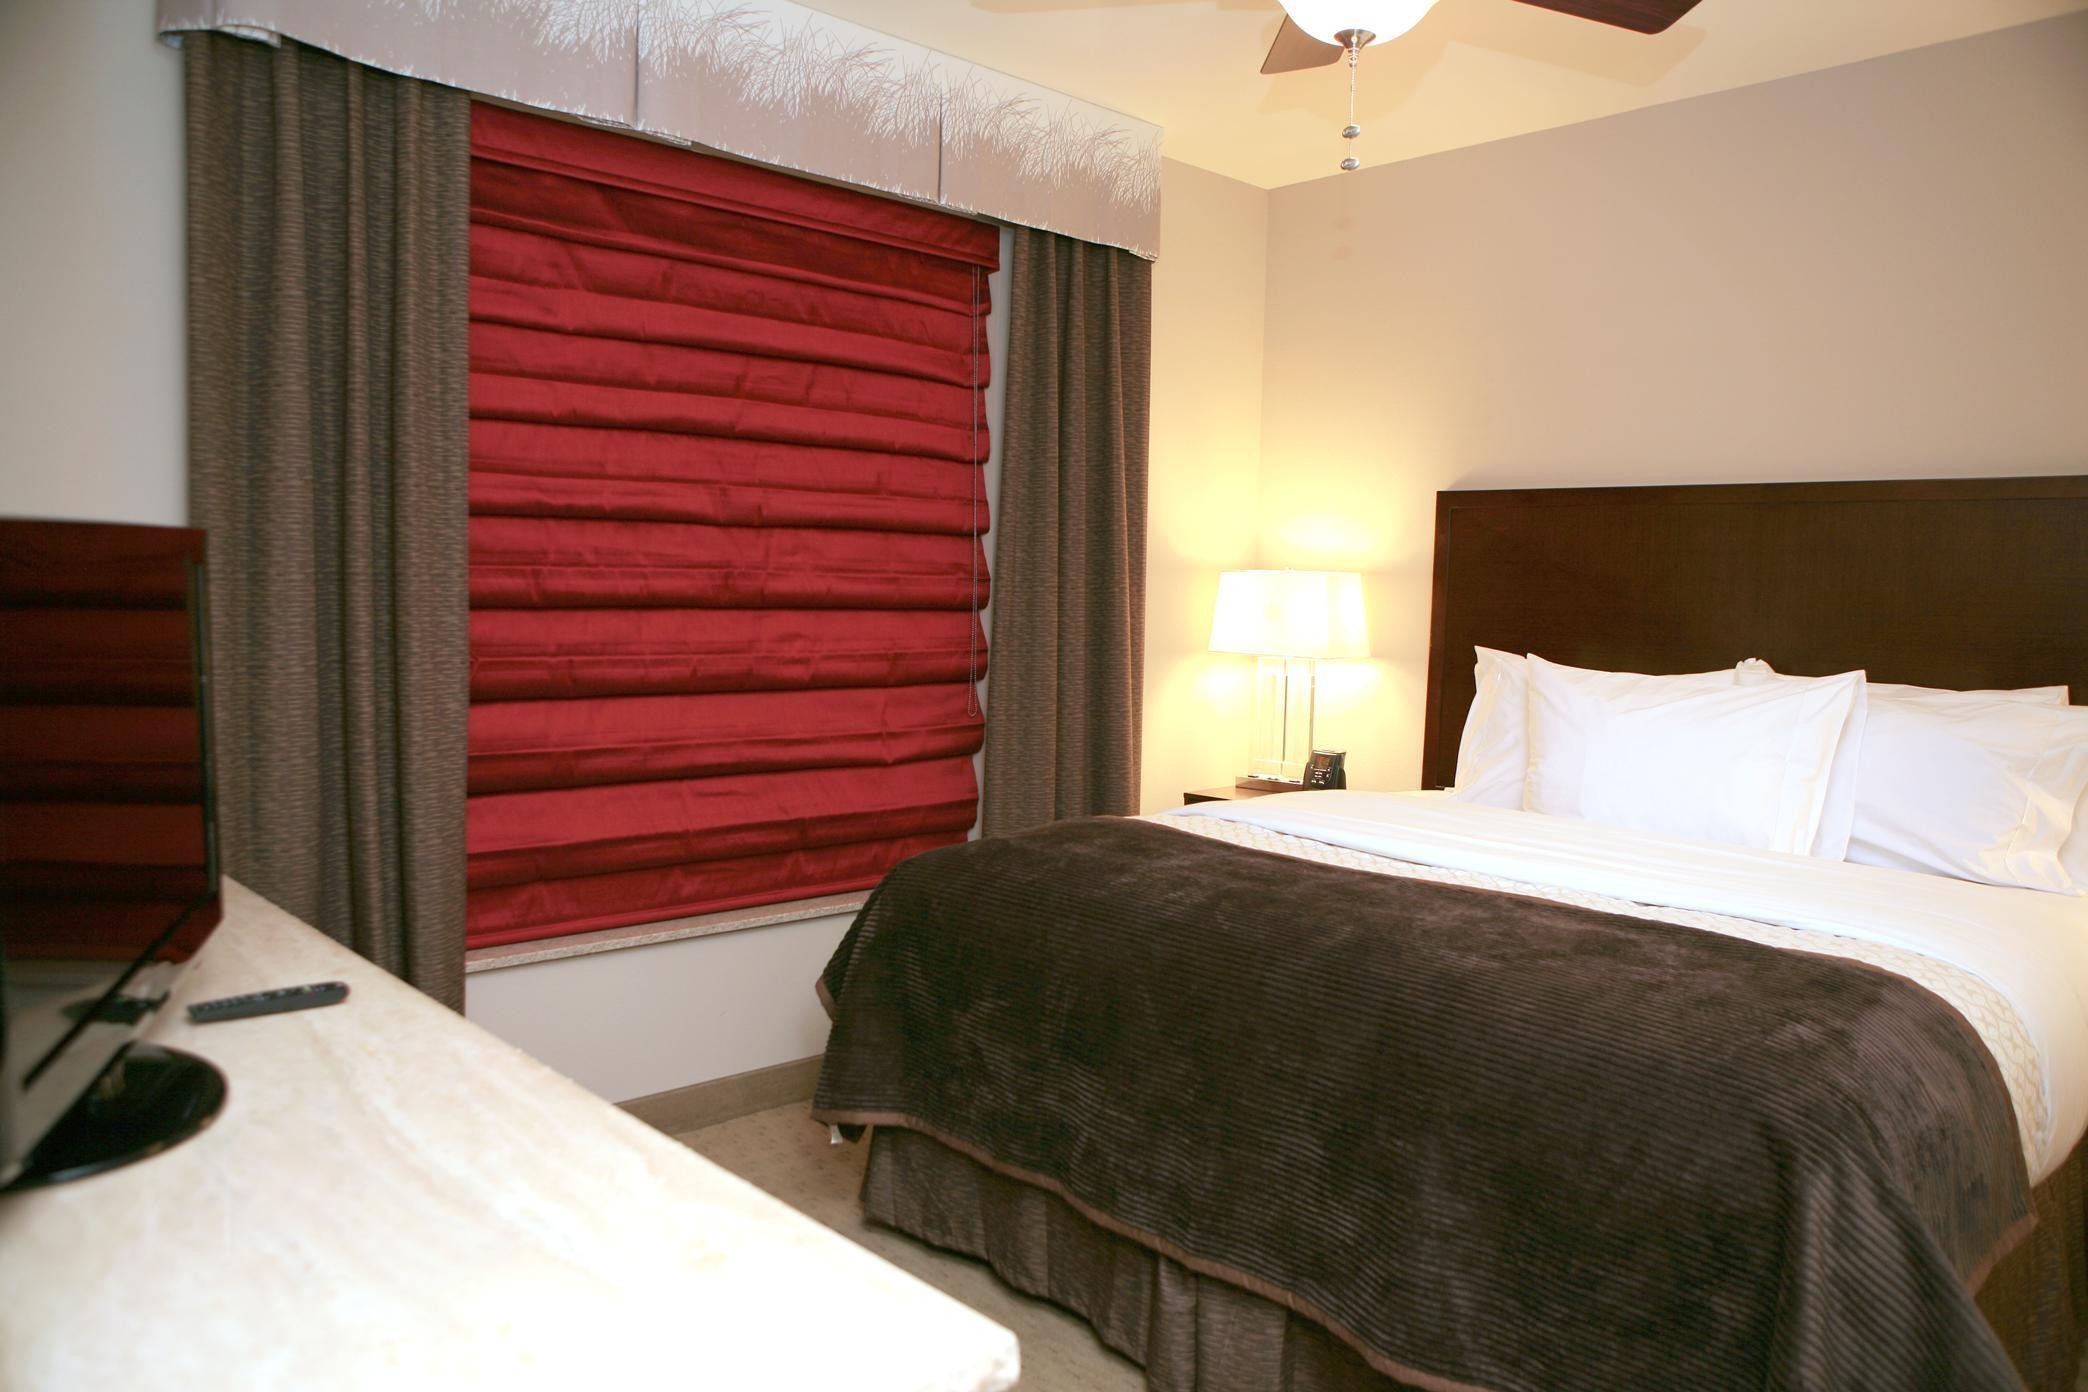 Embassy Suites by Hilton Birmingham Hoover image 30